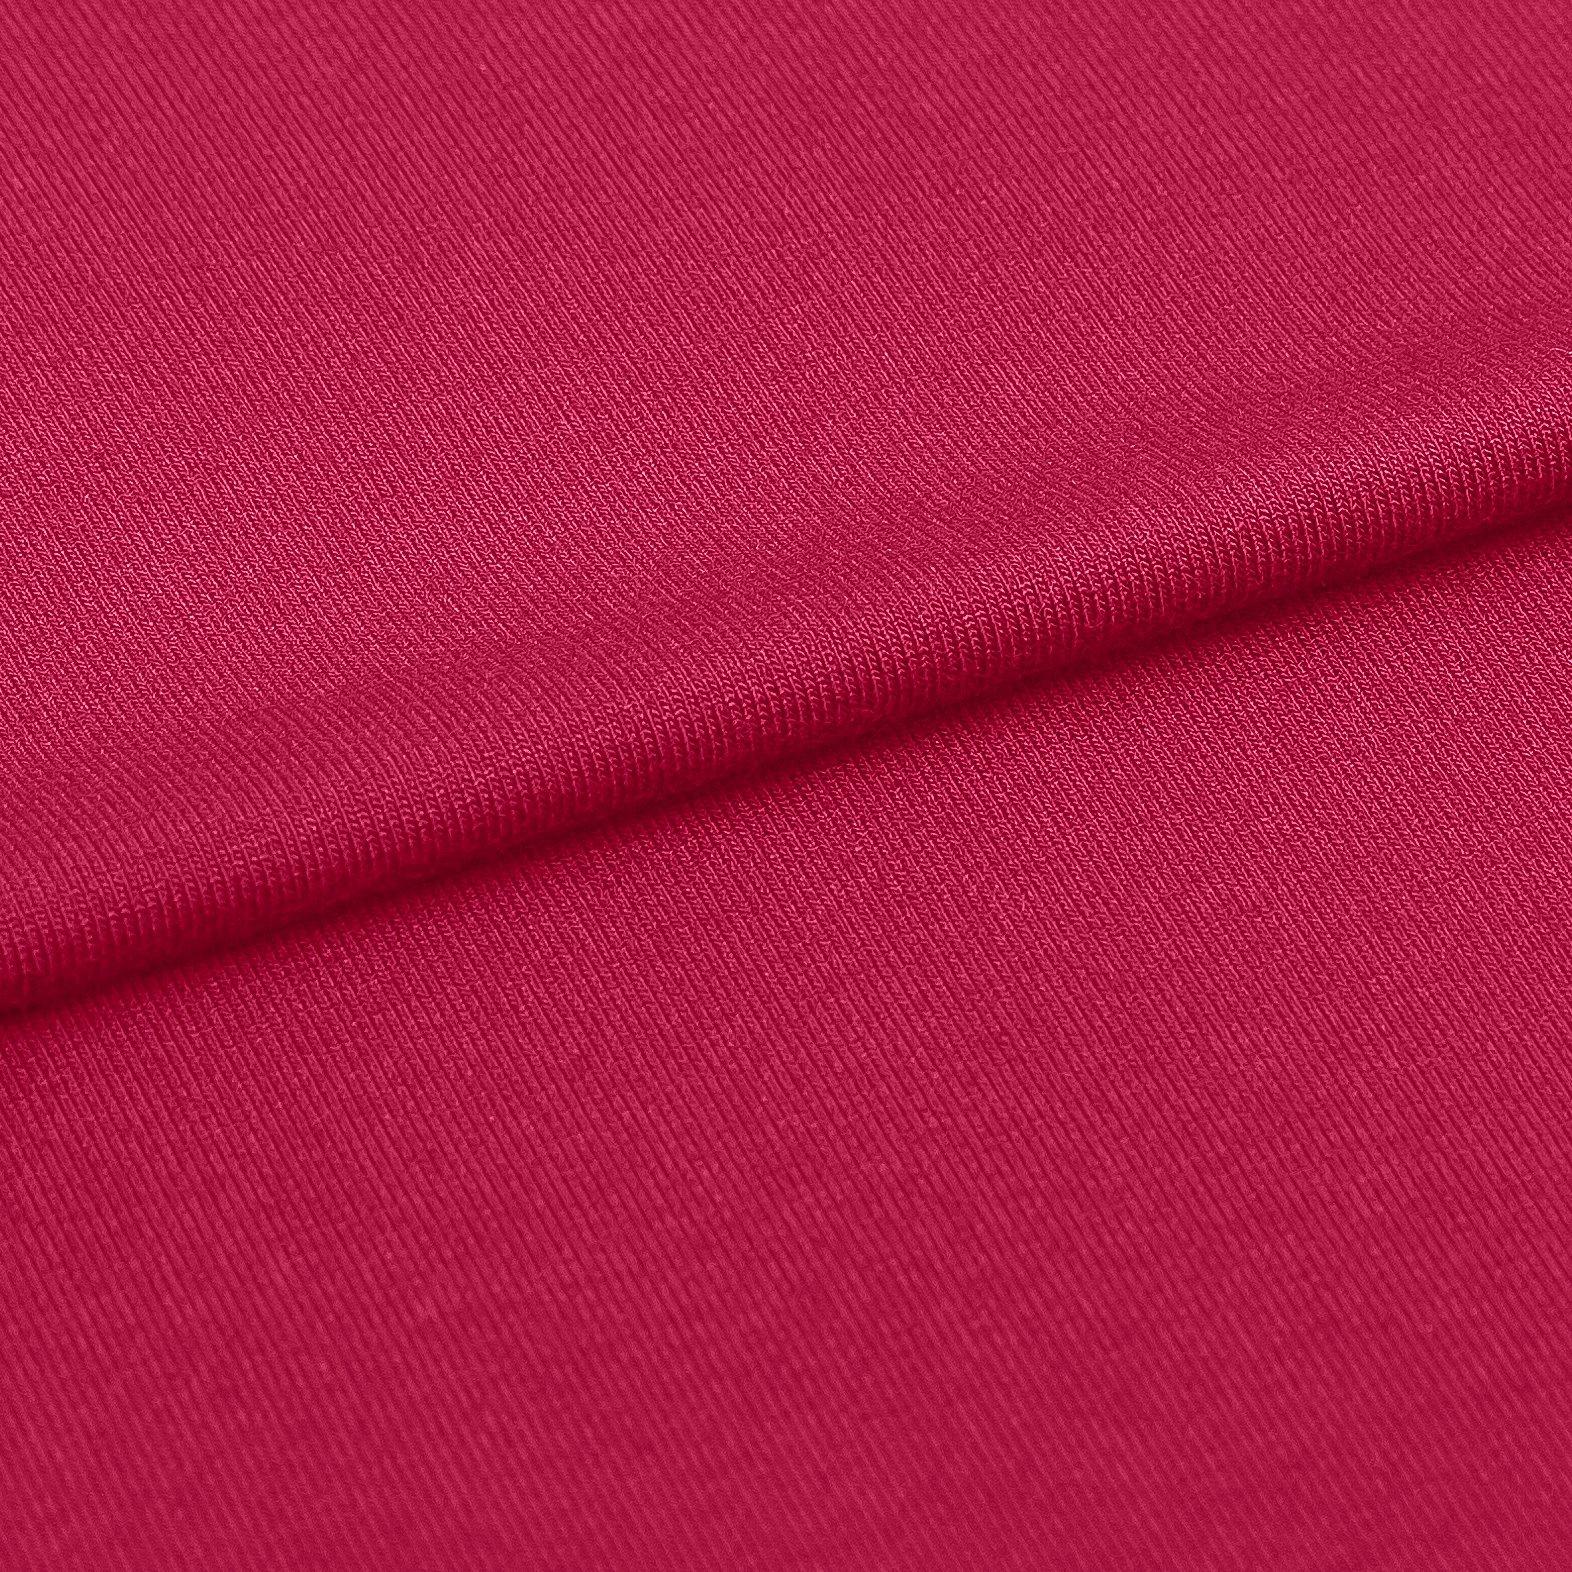 Viscose jersey pink 272466_pack_d